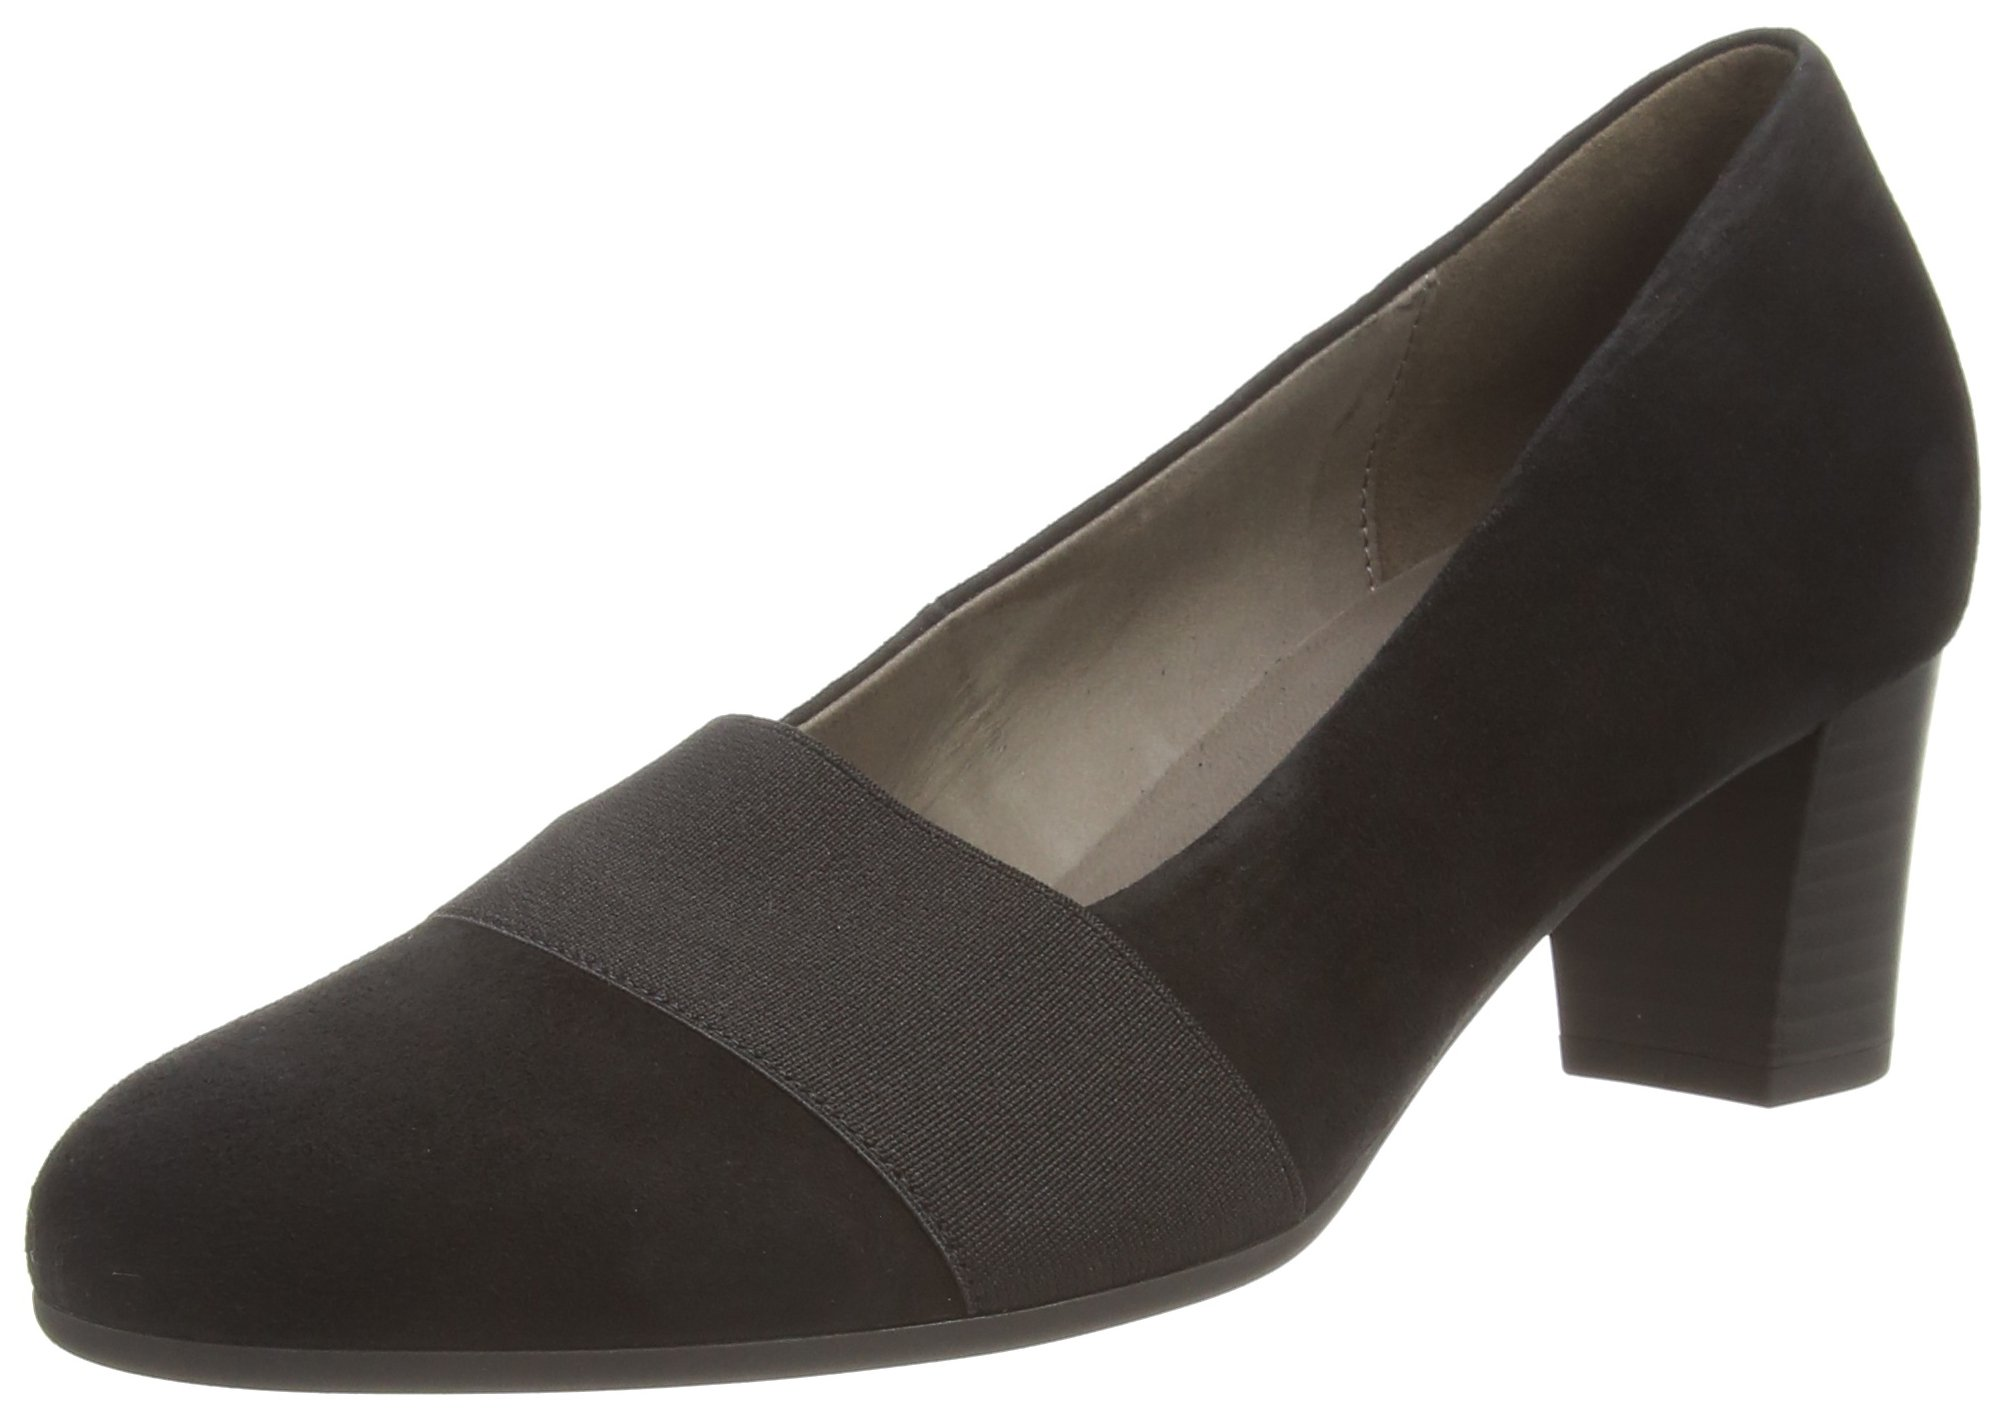 RespectEscarpins Shoes RespectEscarpins Shoes FemmeNoirschwarz Gabor 1740 Gabor sQBtdCxhr